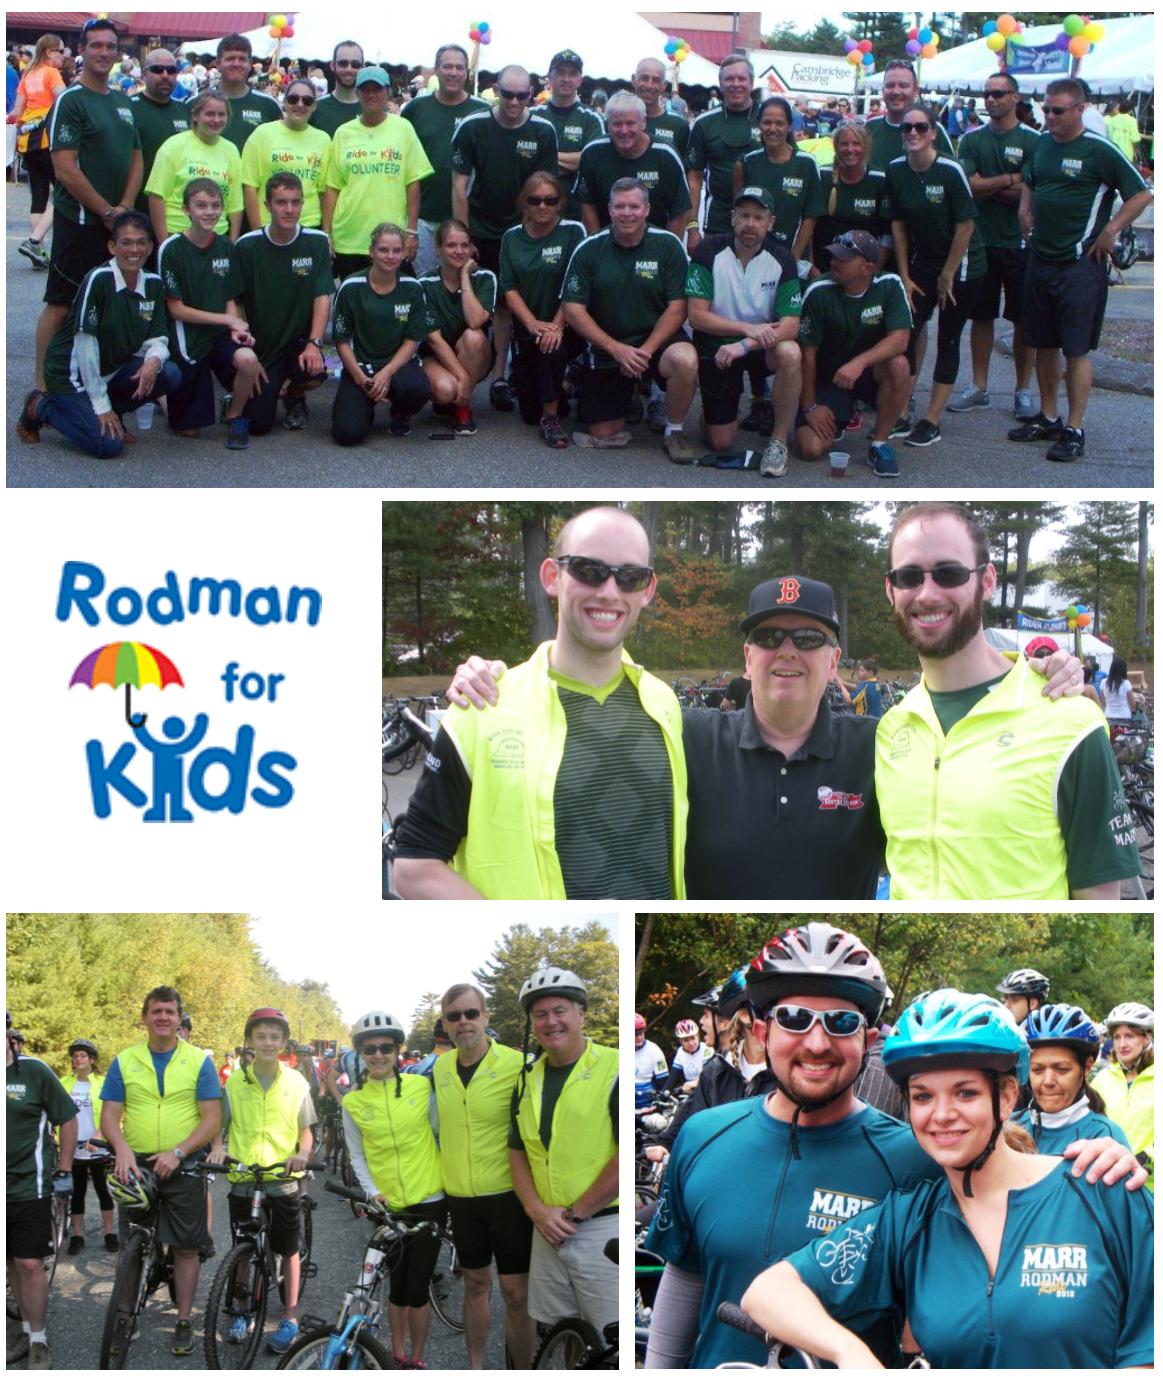 Rodman ride for kids photo collage